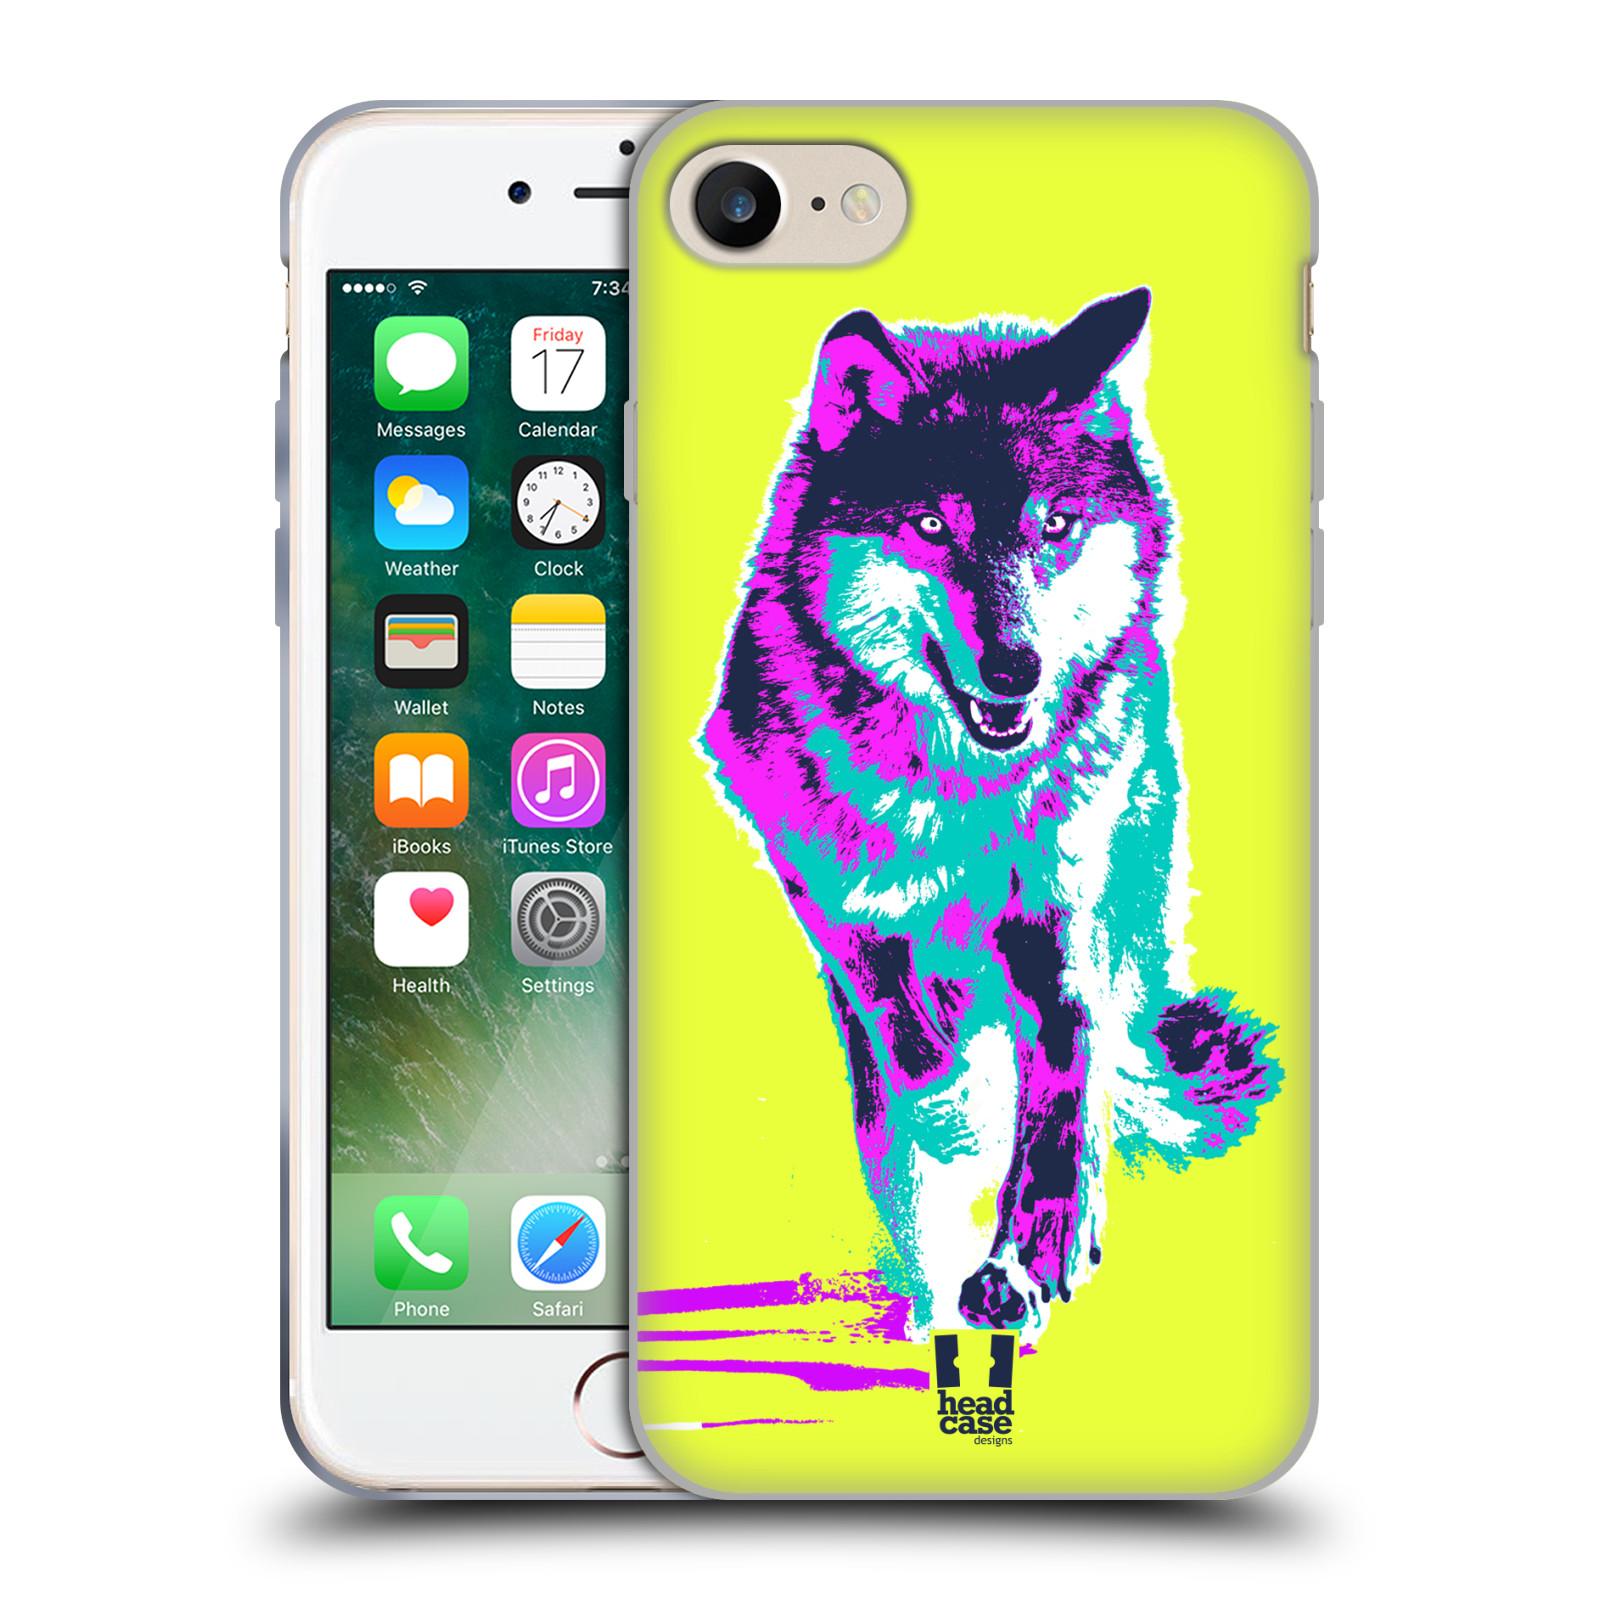 Silikonové pouzdro na mobil Apple iPhone 8 - Head Case - POP PRINT VLK (Silikonový kryt či obal na mobilní telefon Apple iPhone 8 s motivem POP PRINT VLK)